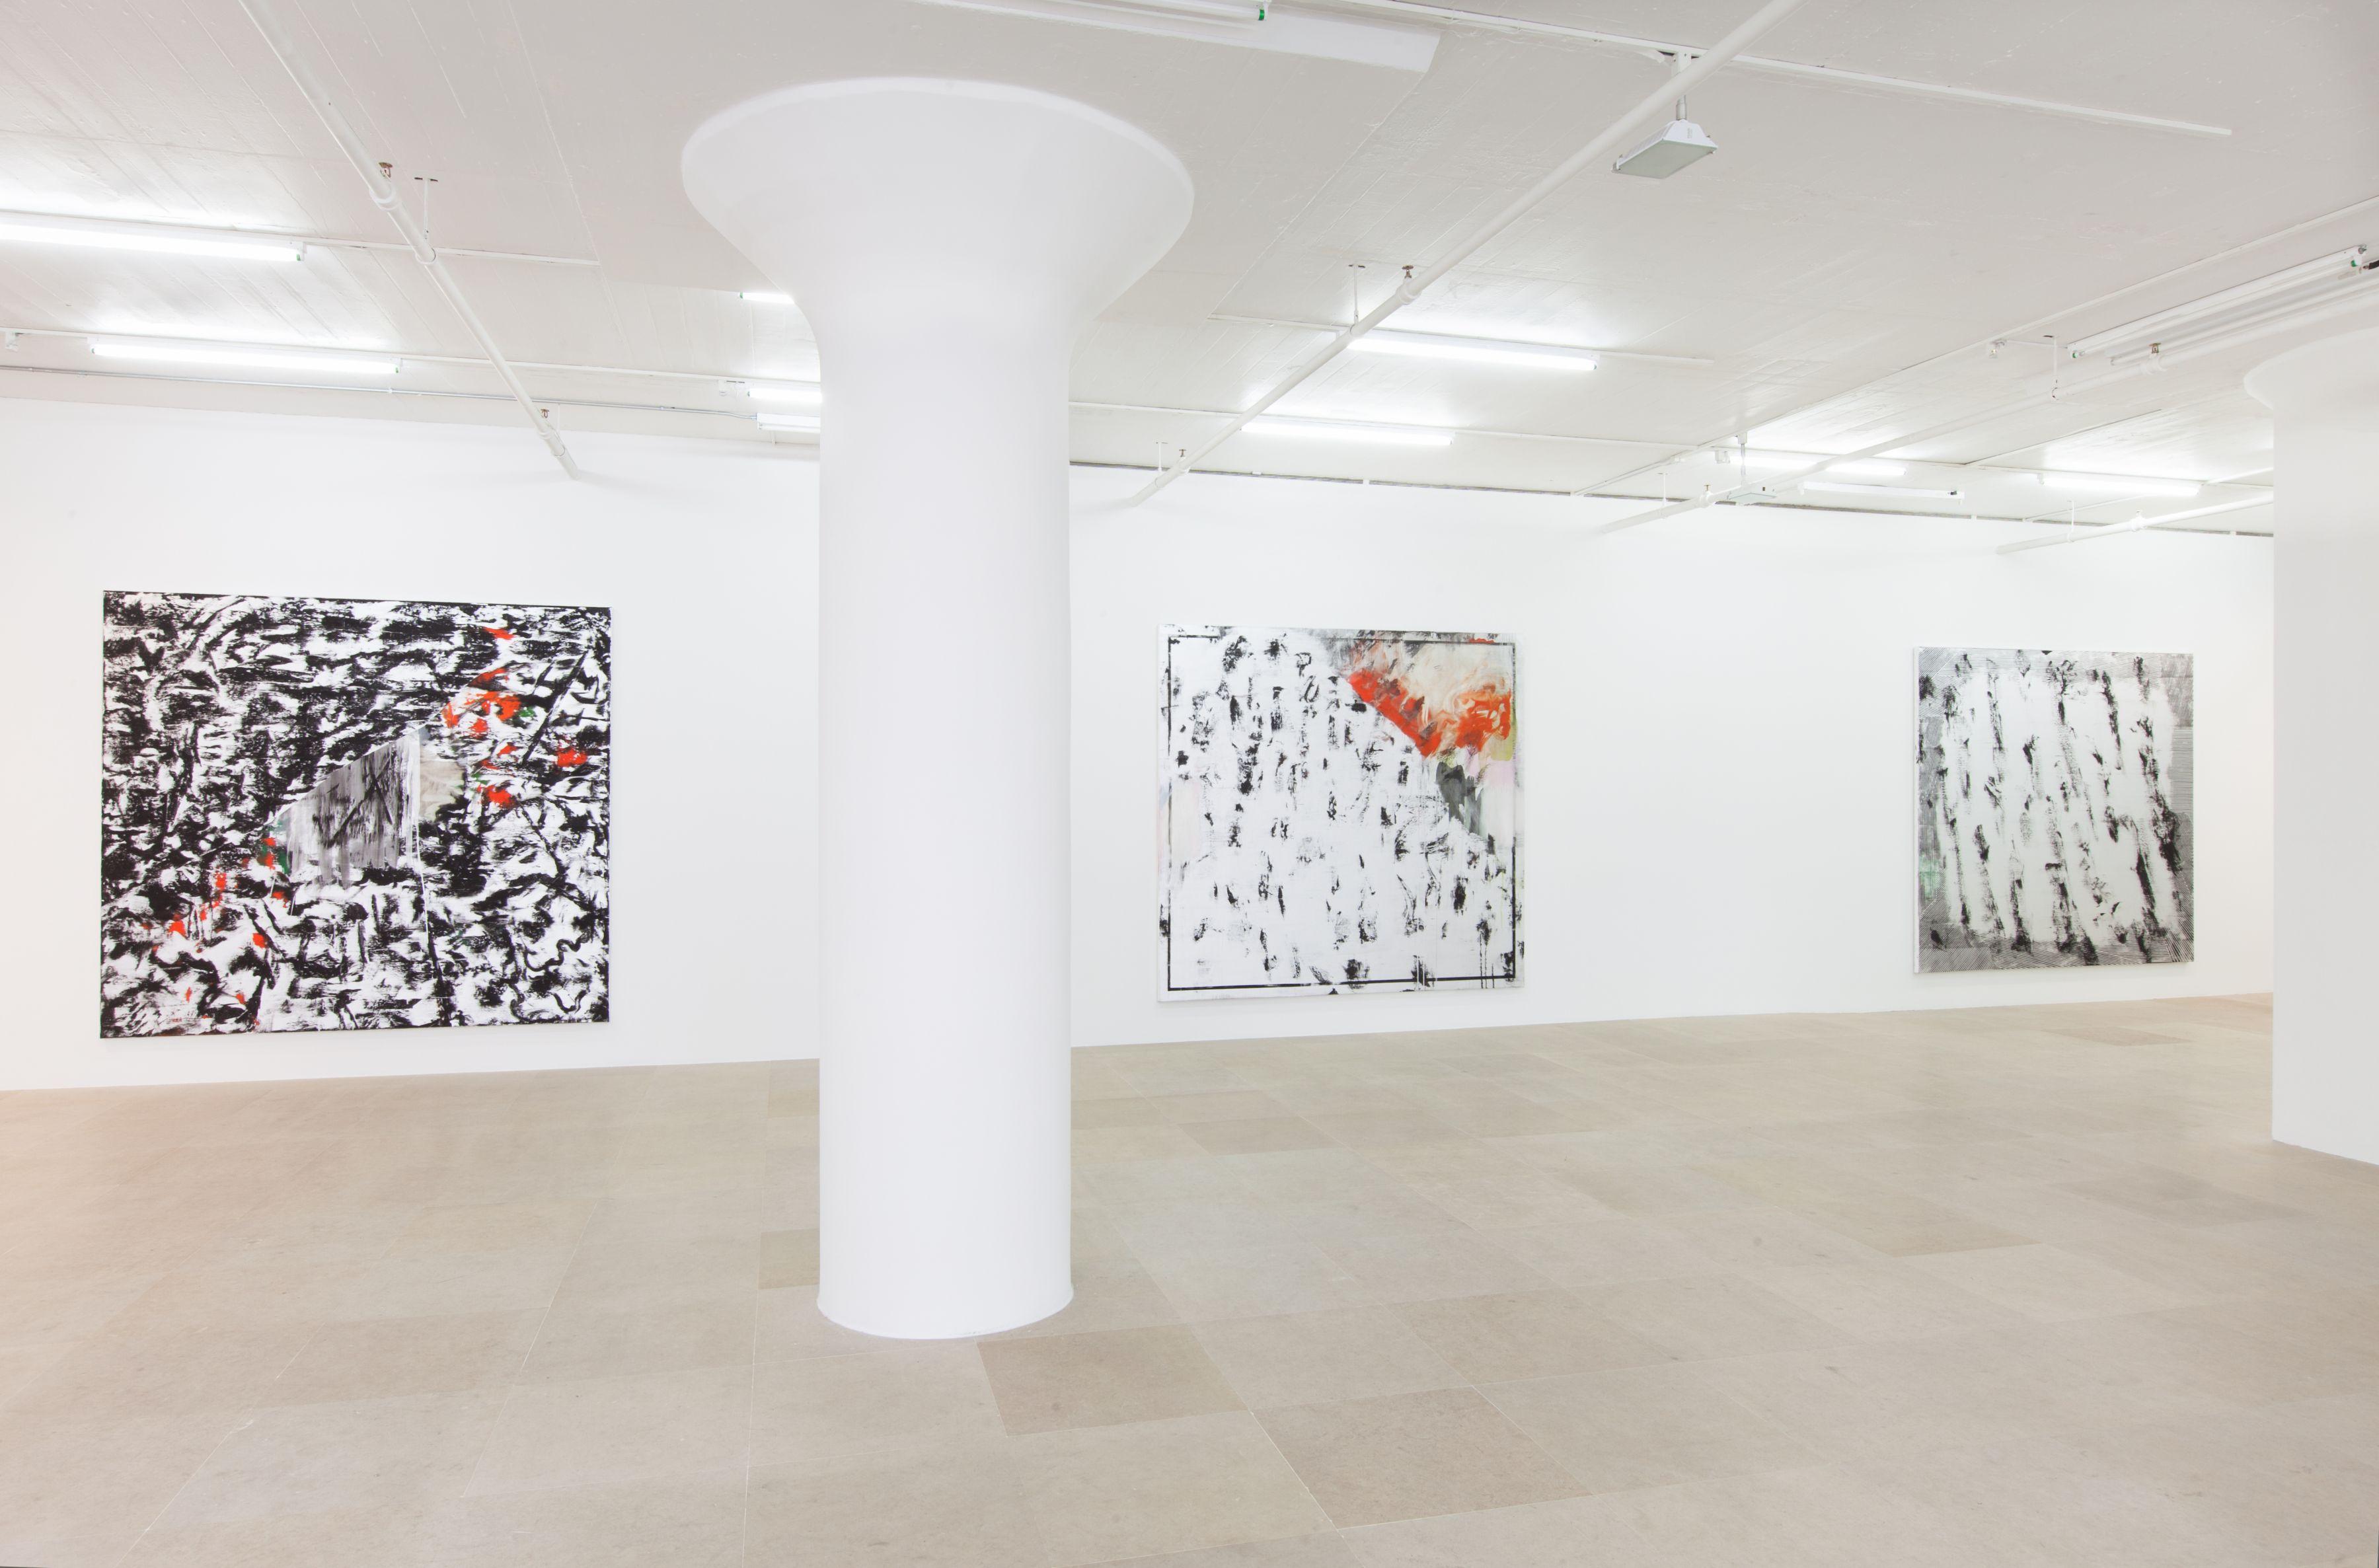 Jacqueline Humphries, Installation view, Greene Naftali, New York, 2012